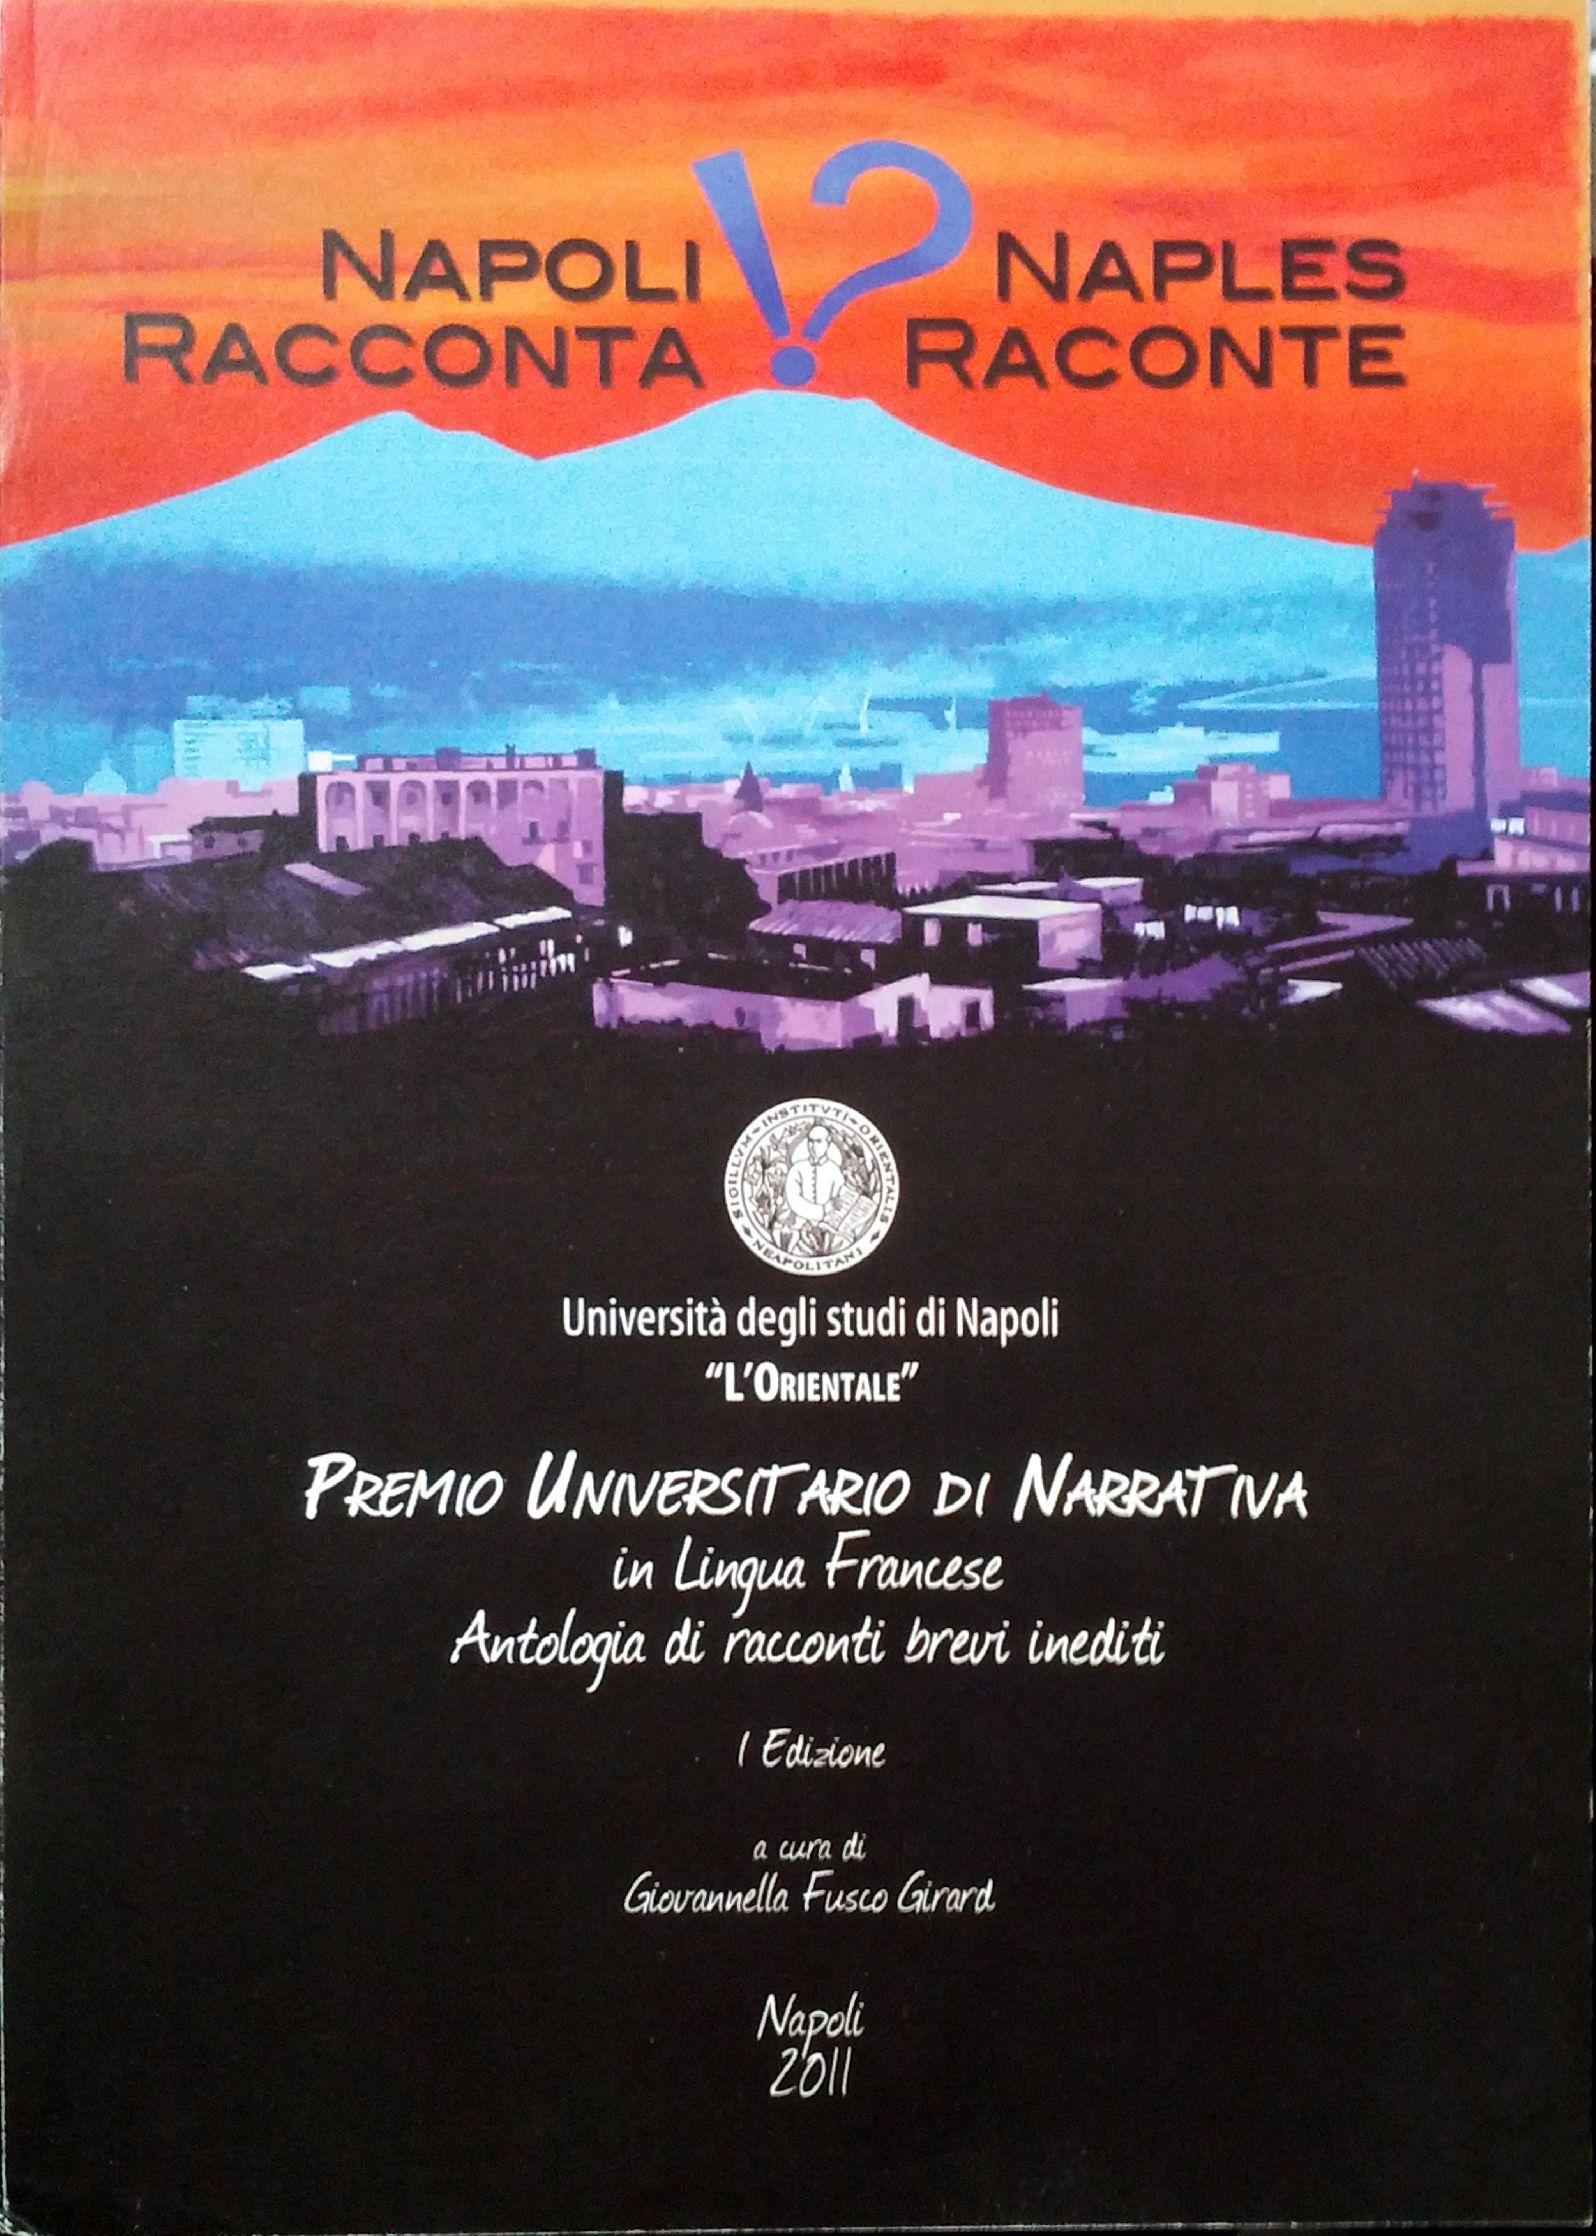 Napoli racconta - Naples raconte